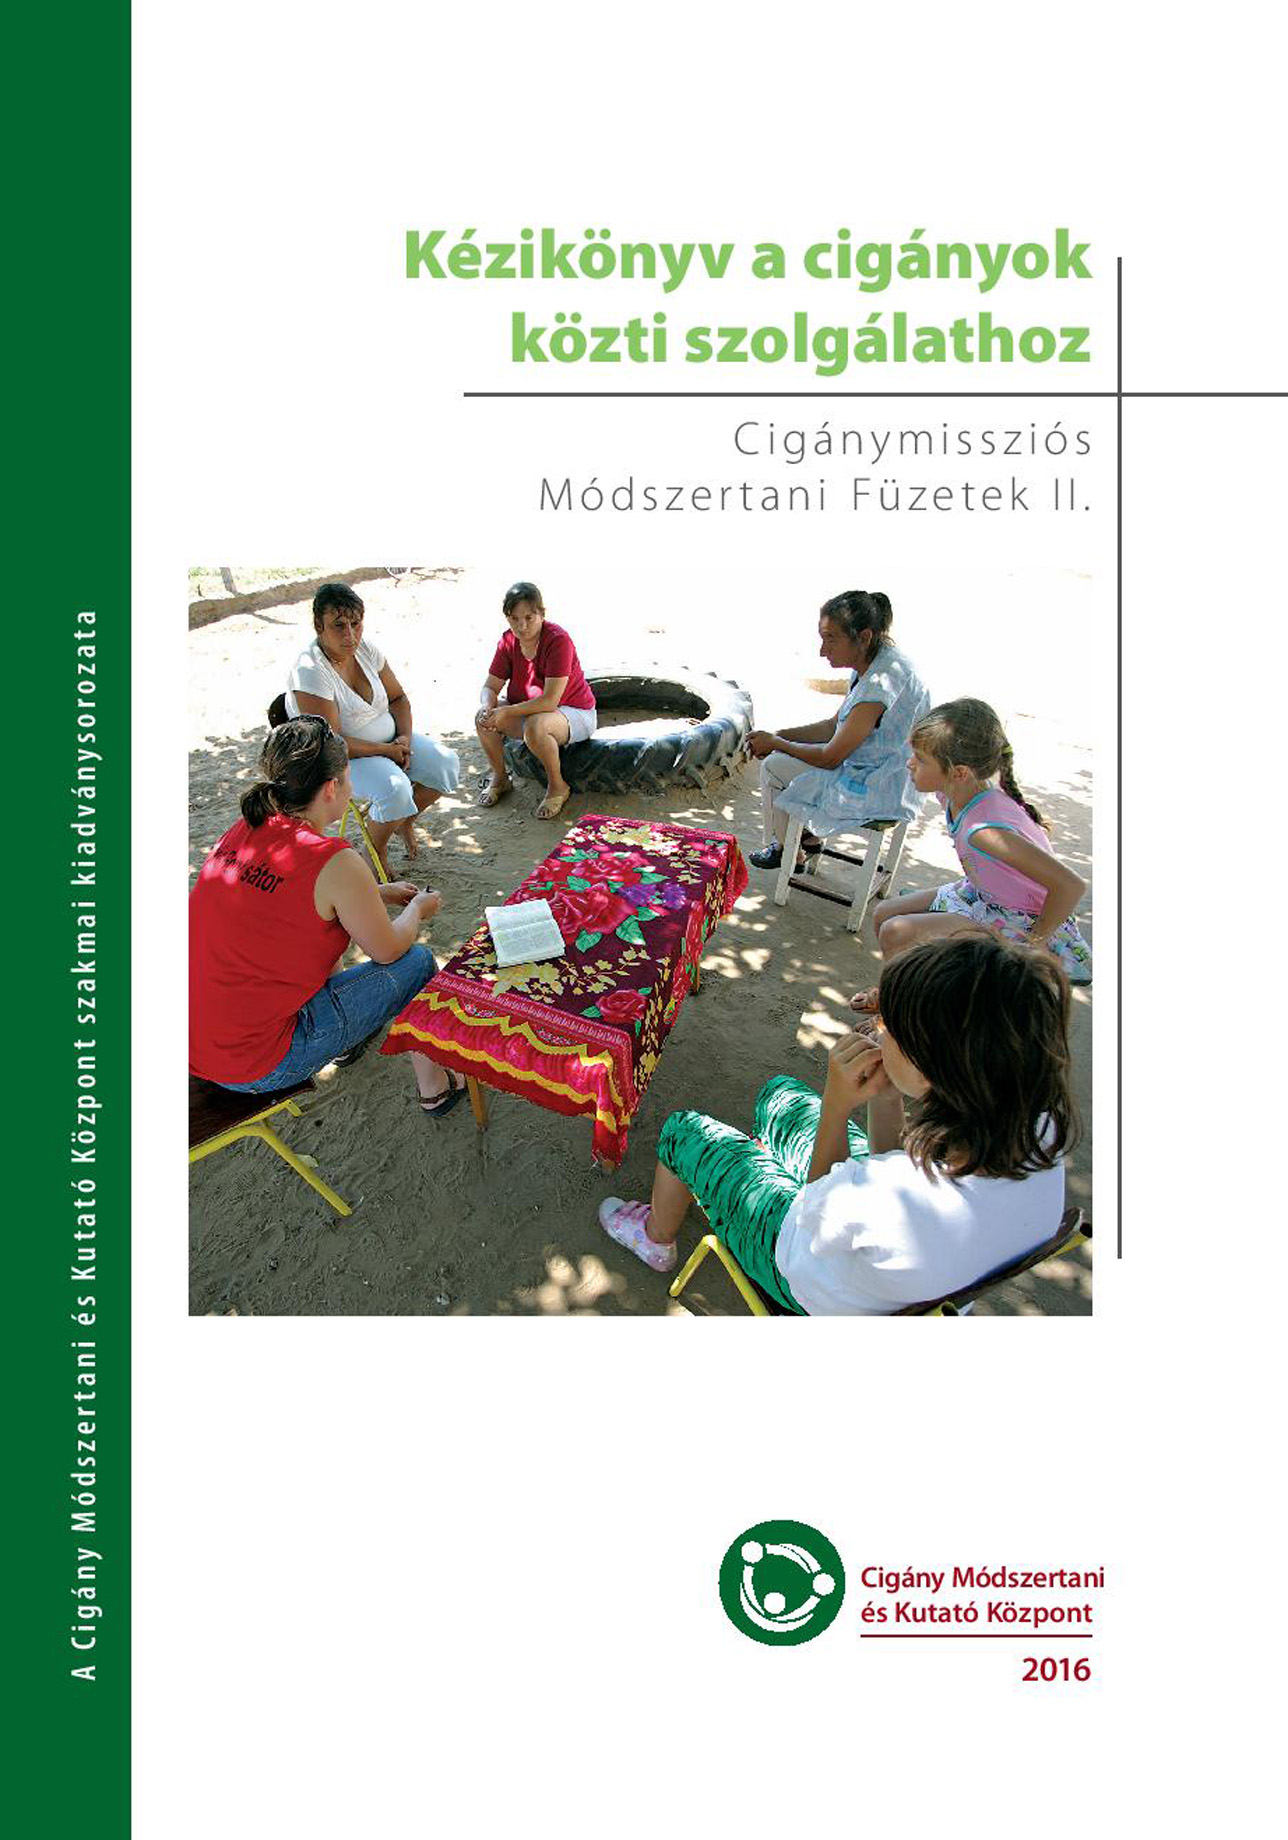 ModszertaniFuzetek_II_cover-3-page-001_0